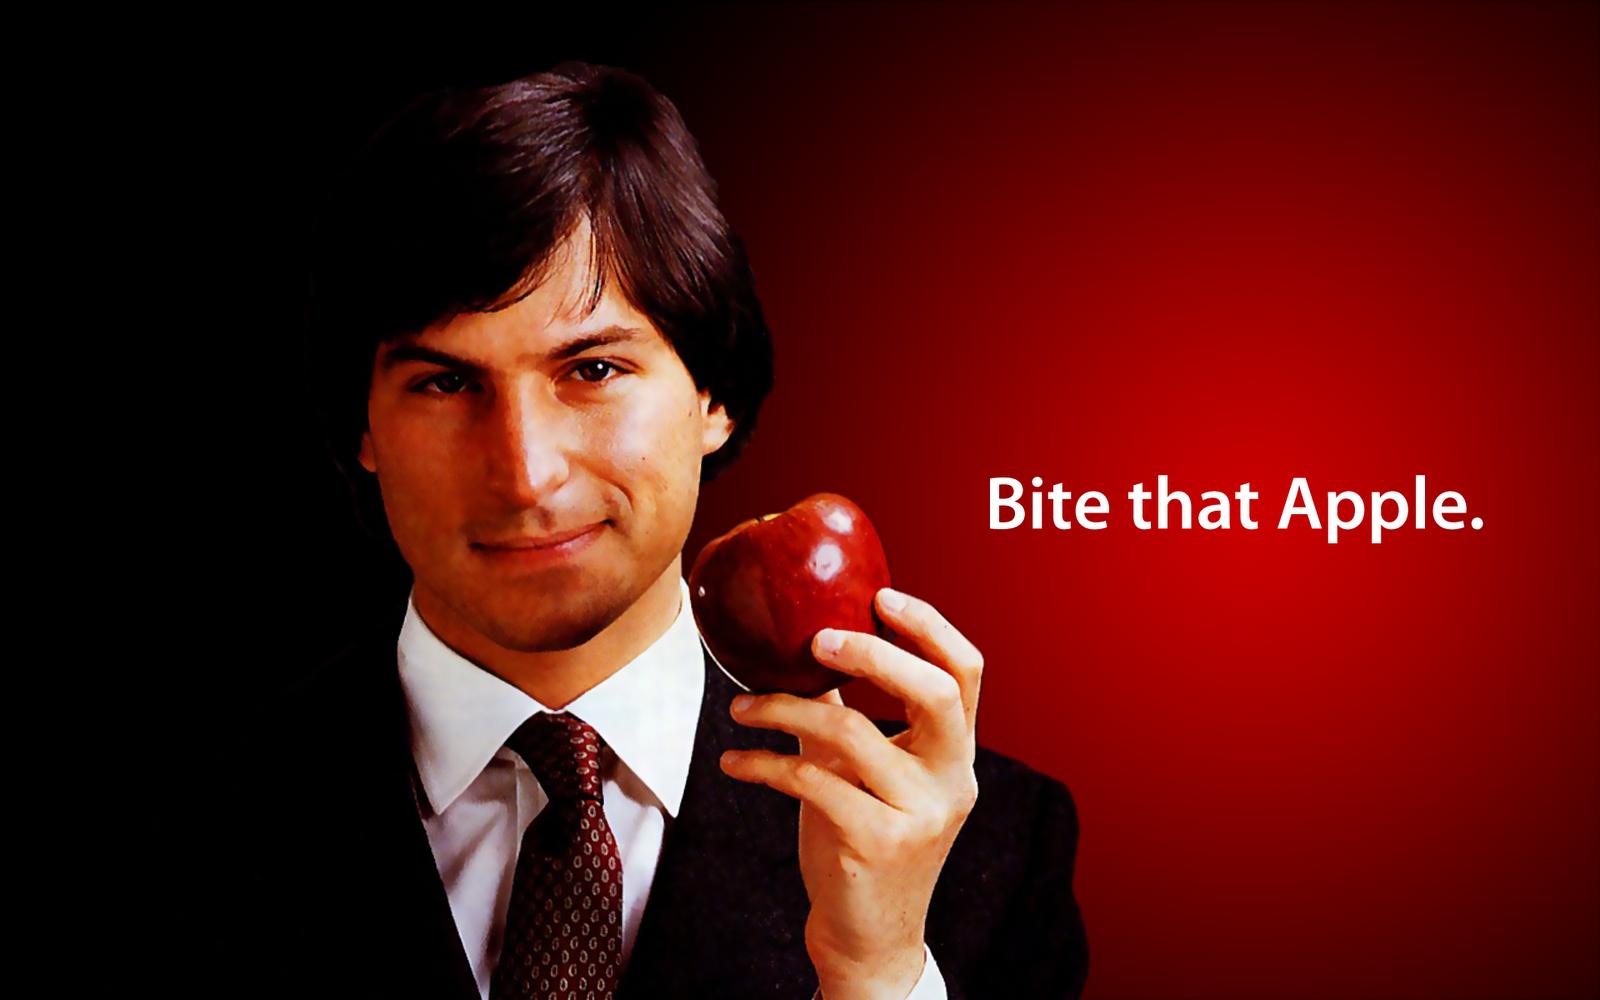 Hd Wallpapers 1080p Steve Jobs Apple Wallpaper Hd 1080p